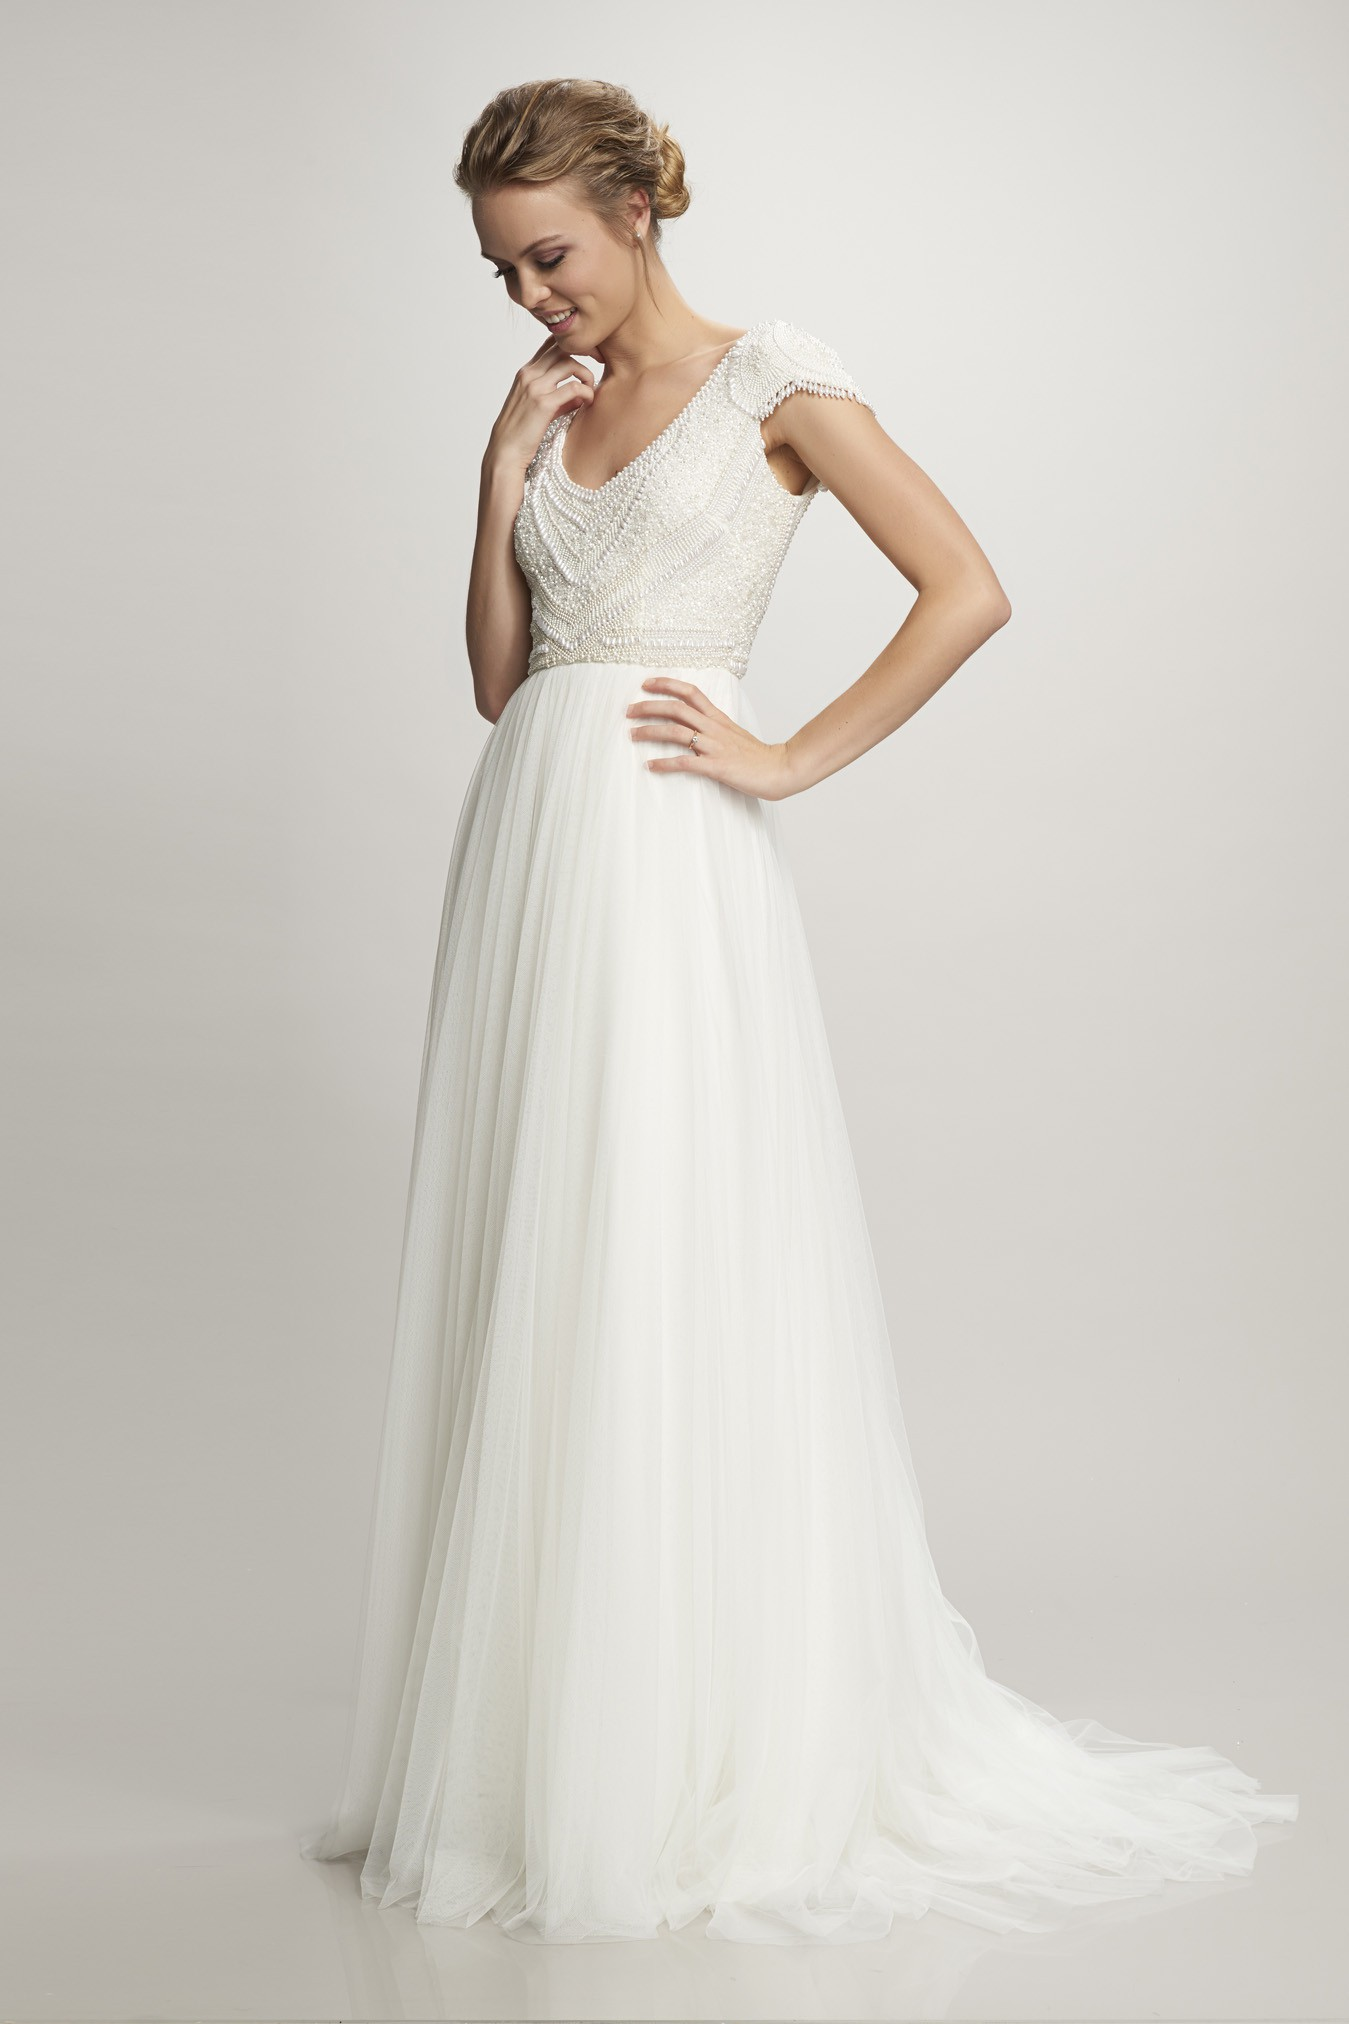 Theia Couture Nima Sample Wedding Dress On Sale 56 Off